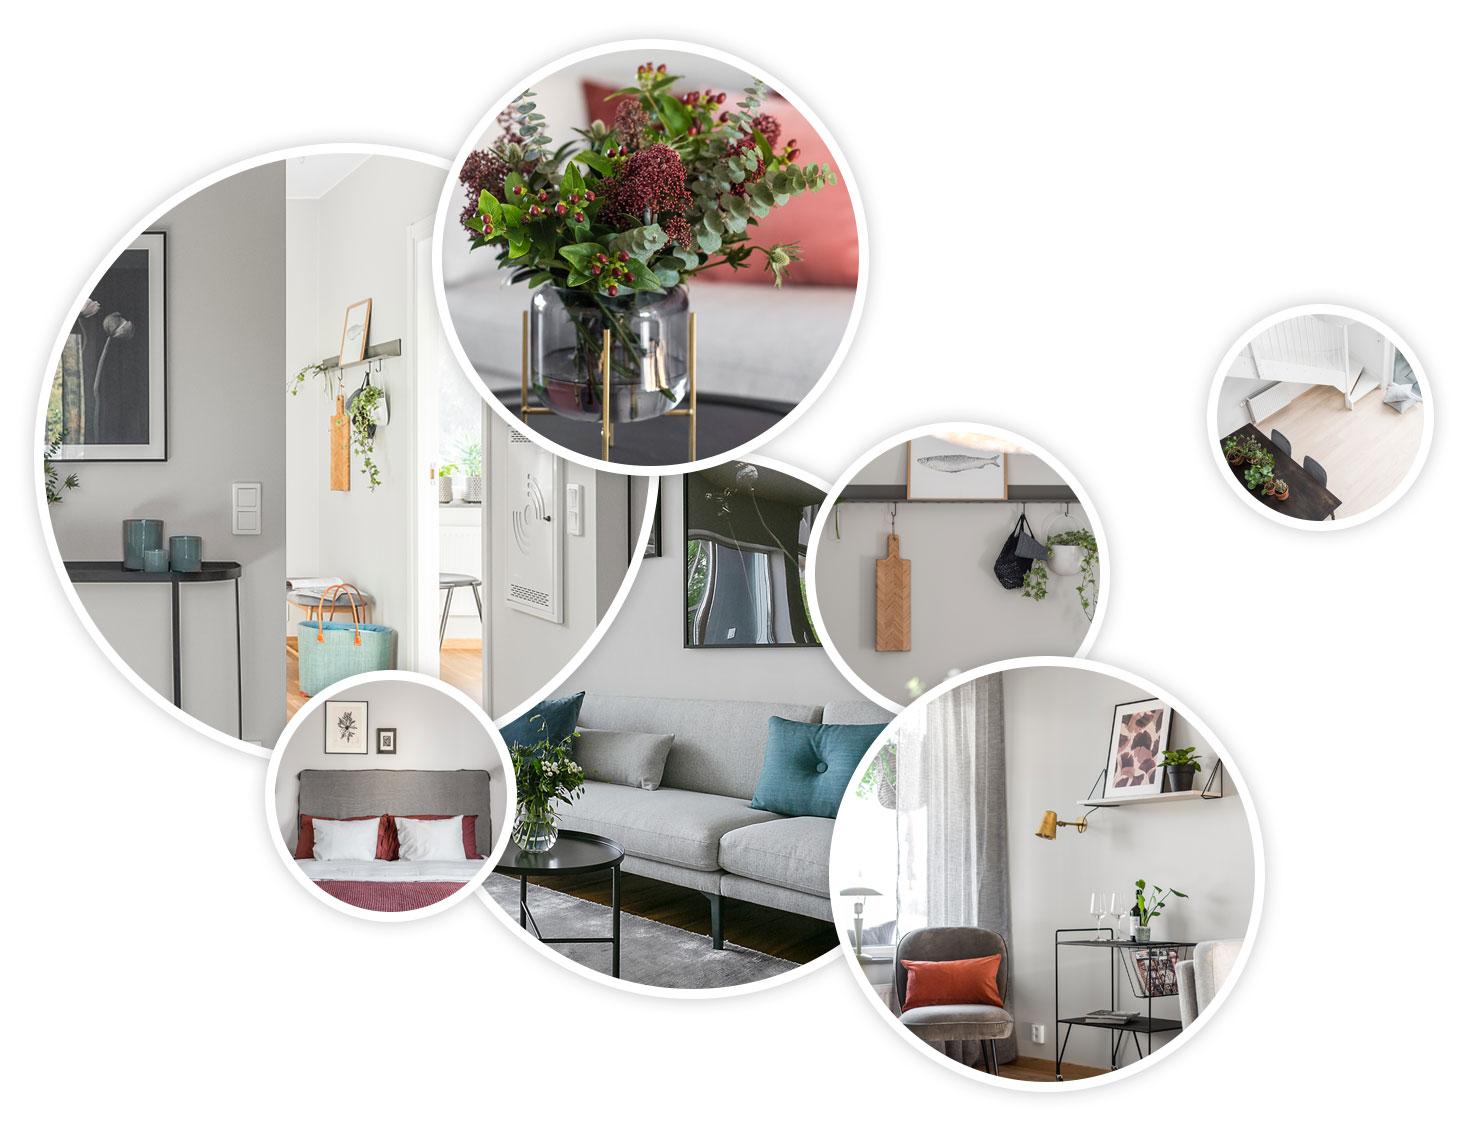 Stilverkstan homestyling inredningsbilder